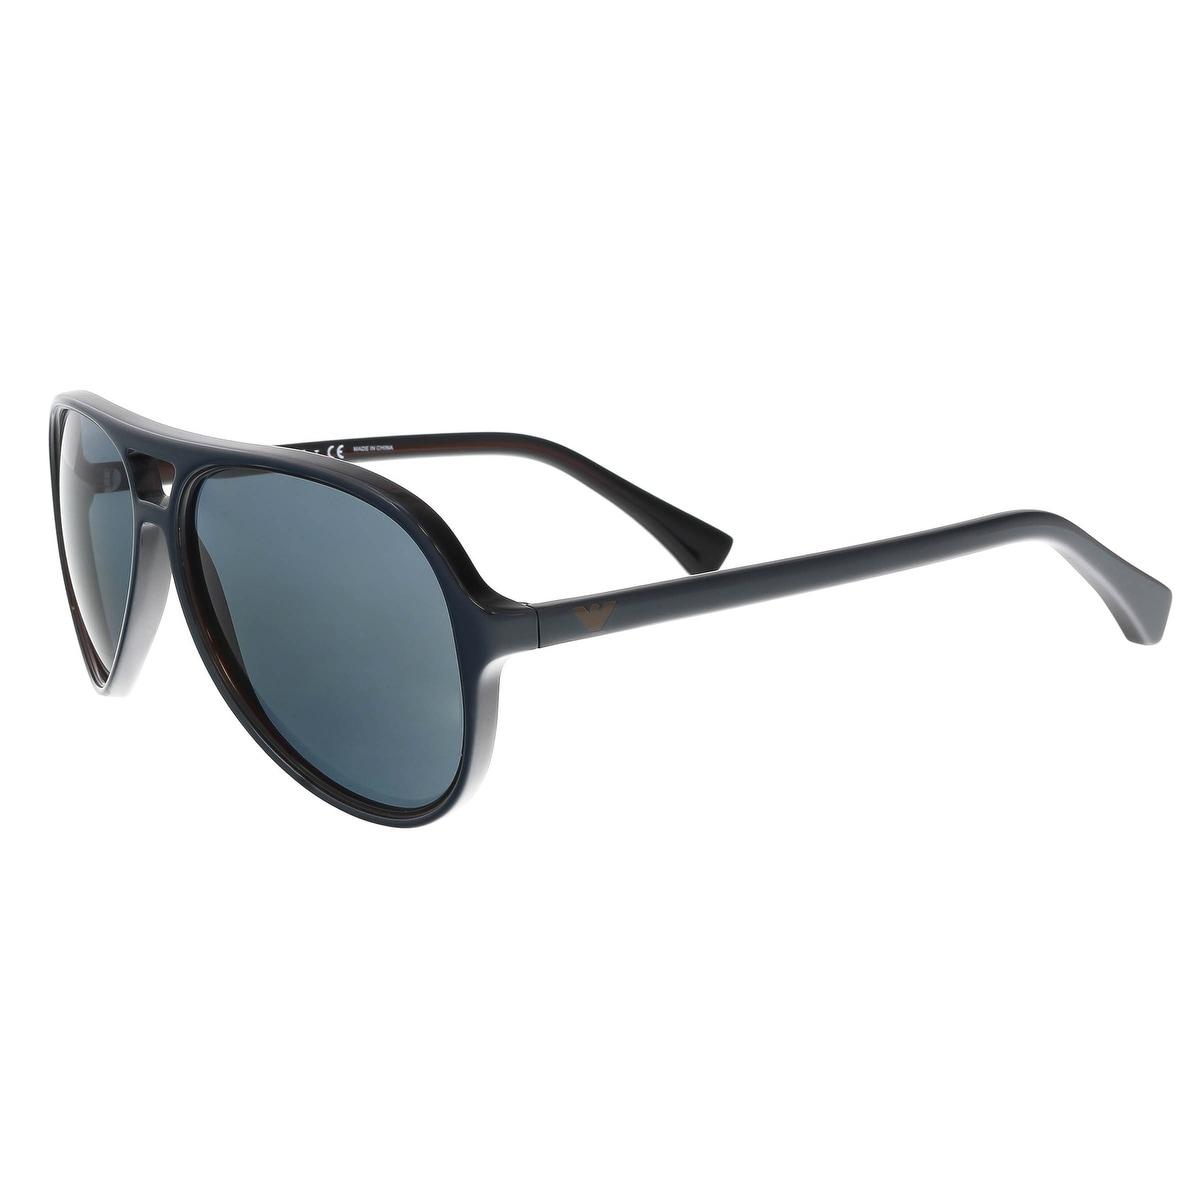 e05e0305ae8 Shop Emporio Armani EA4063 546687 Navy Oval Sunglasses - 58-15-140 - Free  Shipping Today - Overstock - 19447414